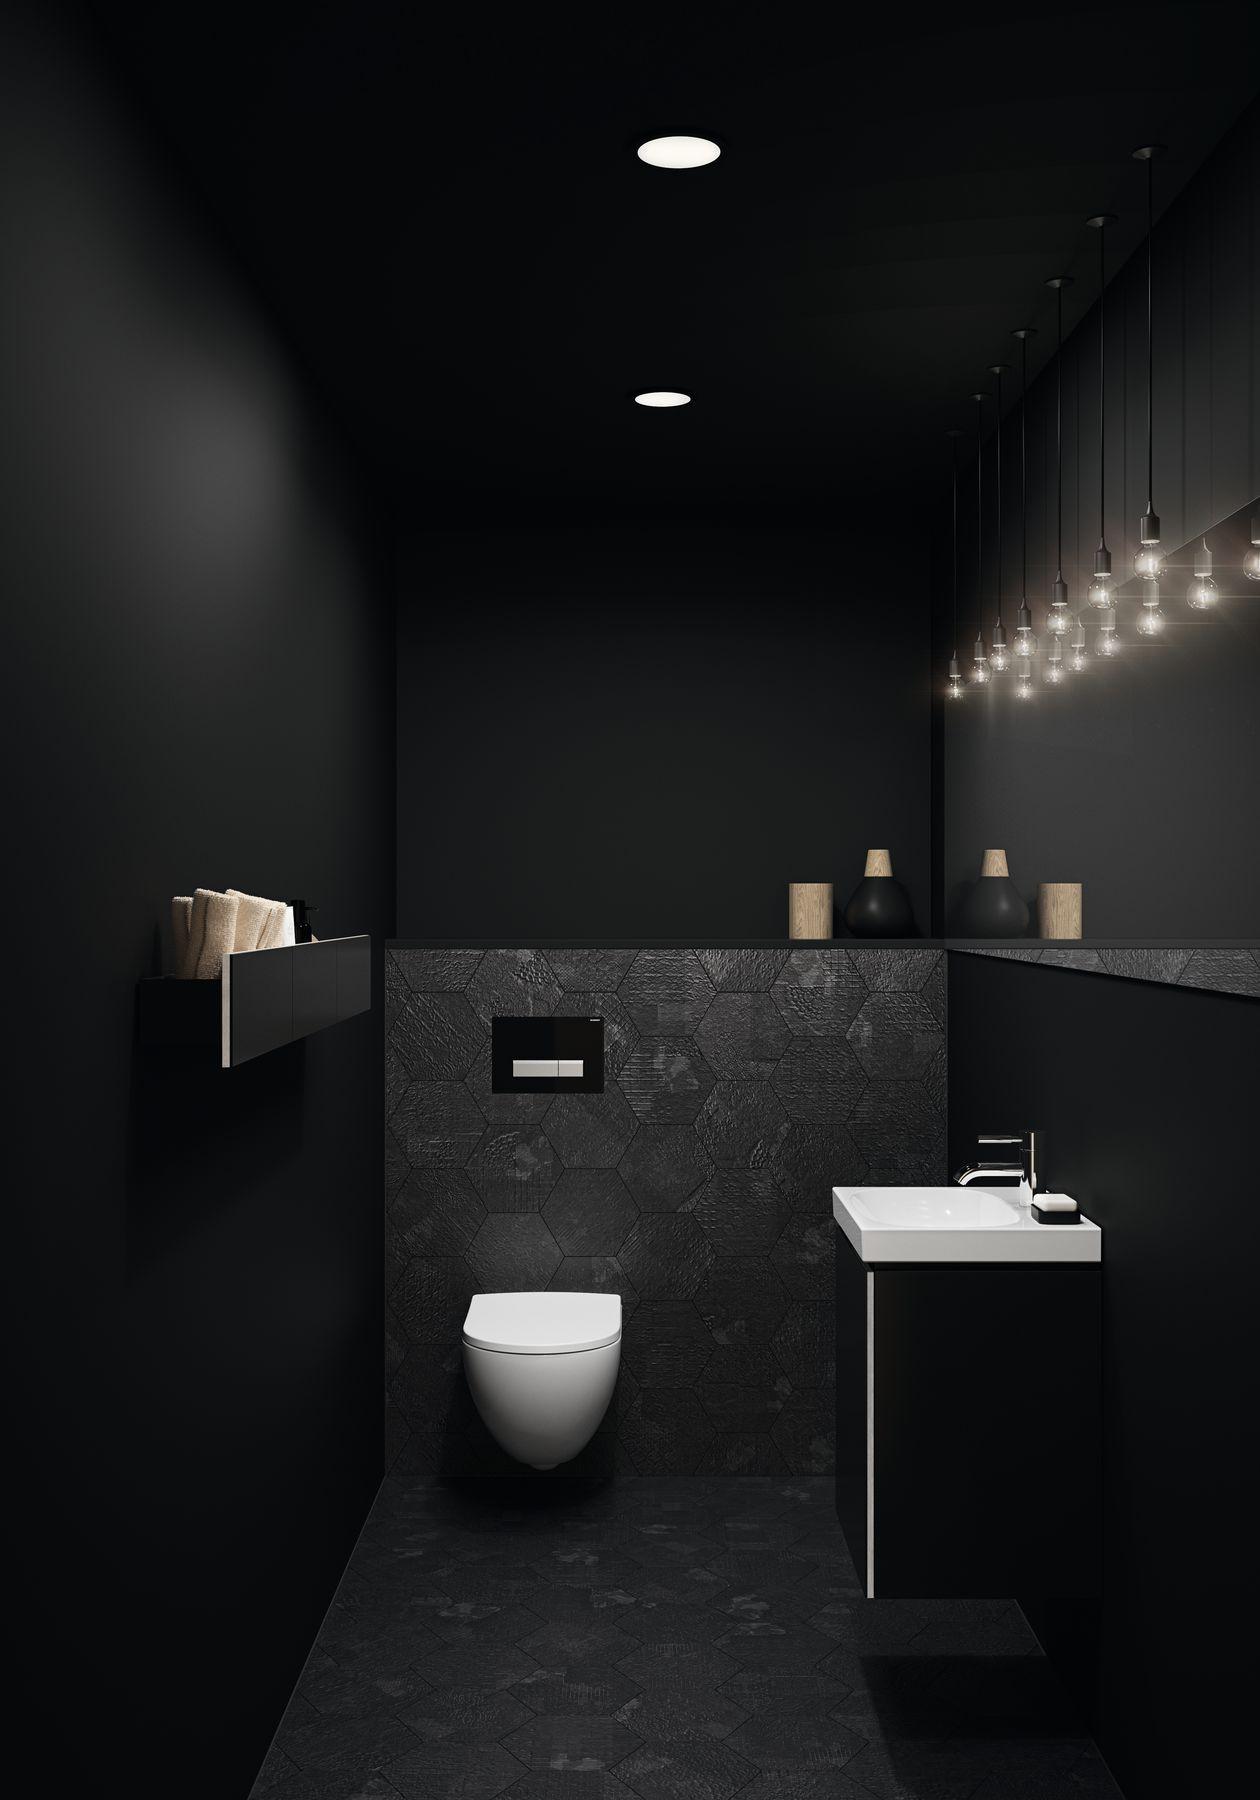 Salle de bains invités façon Keramag Acanto : WC suspendu ...